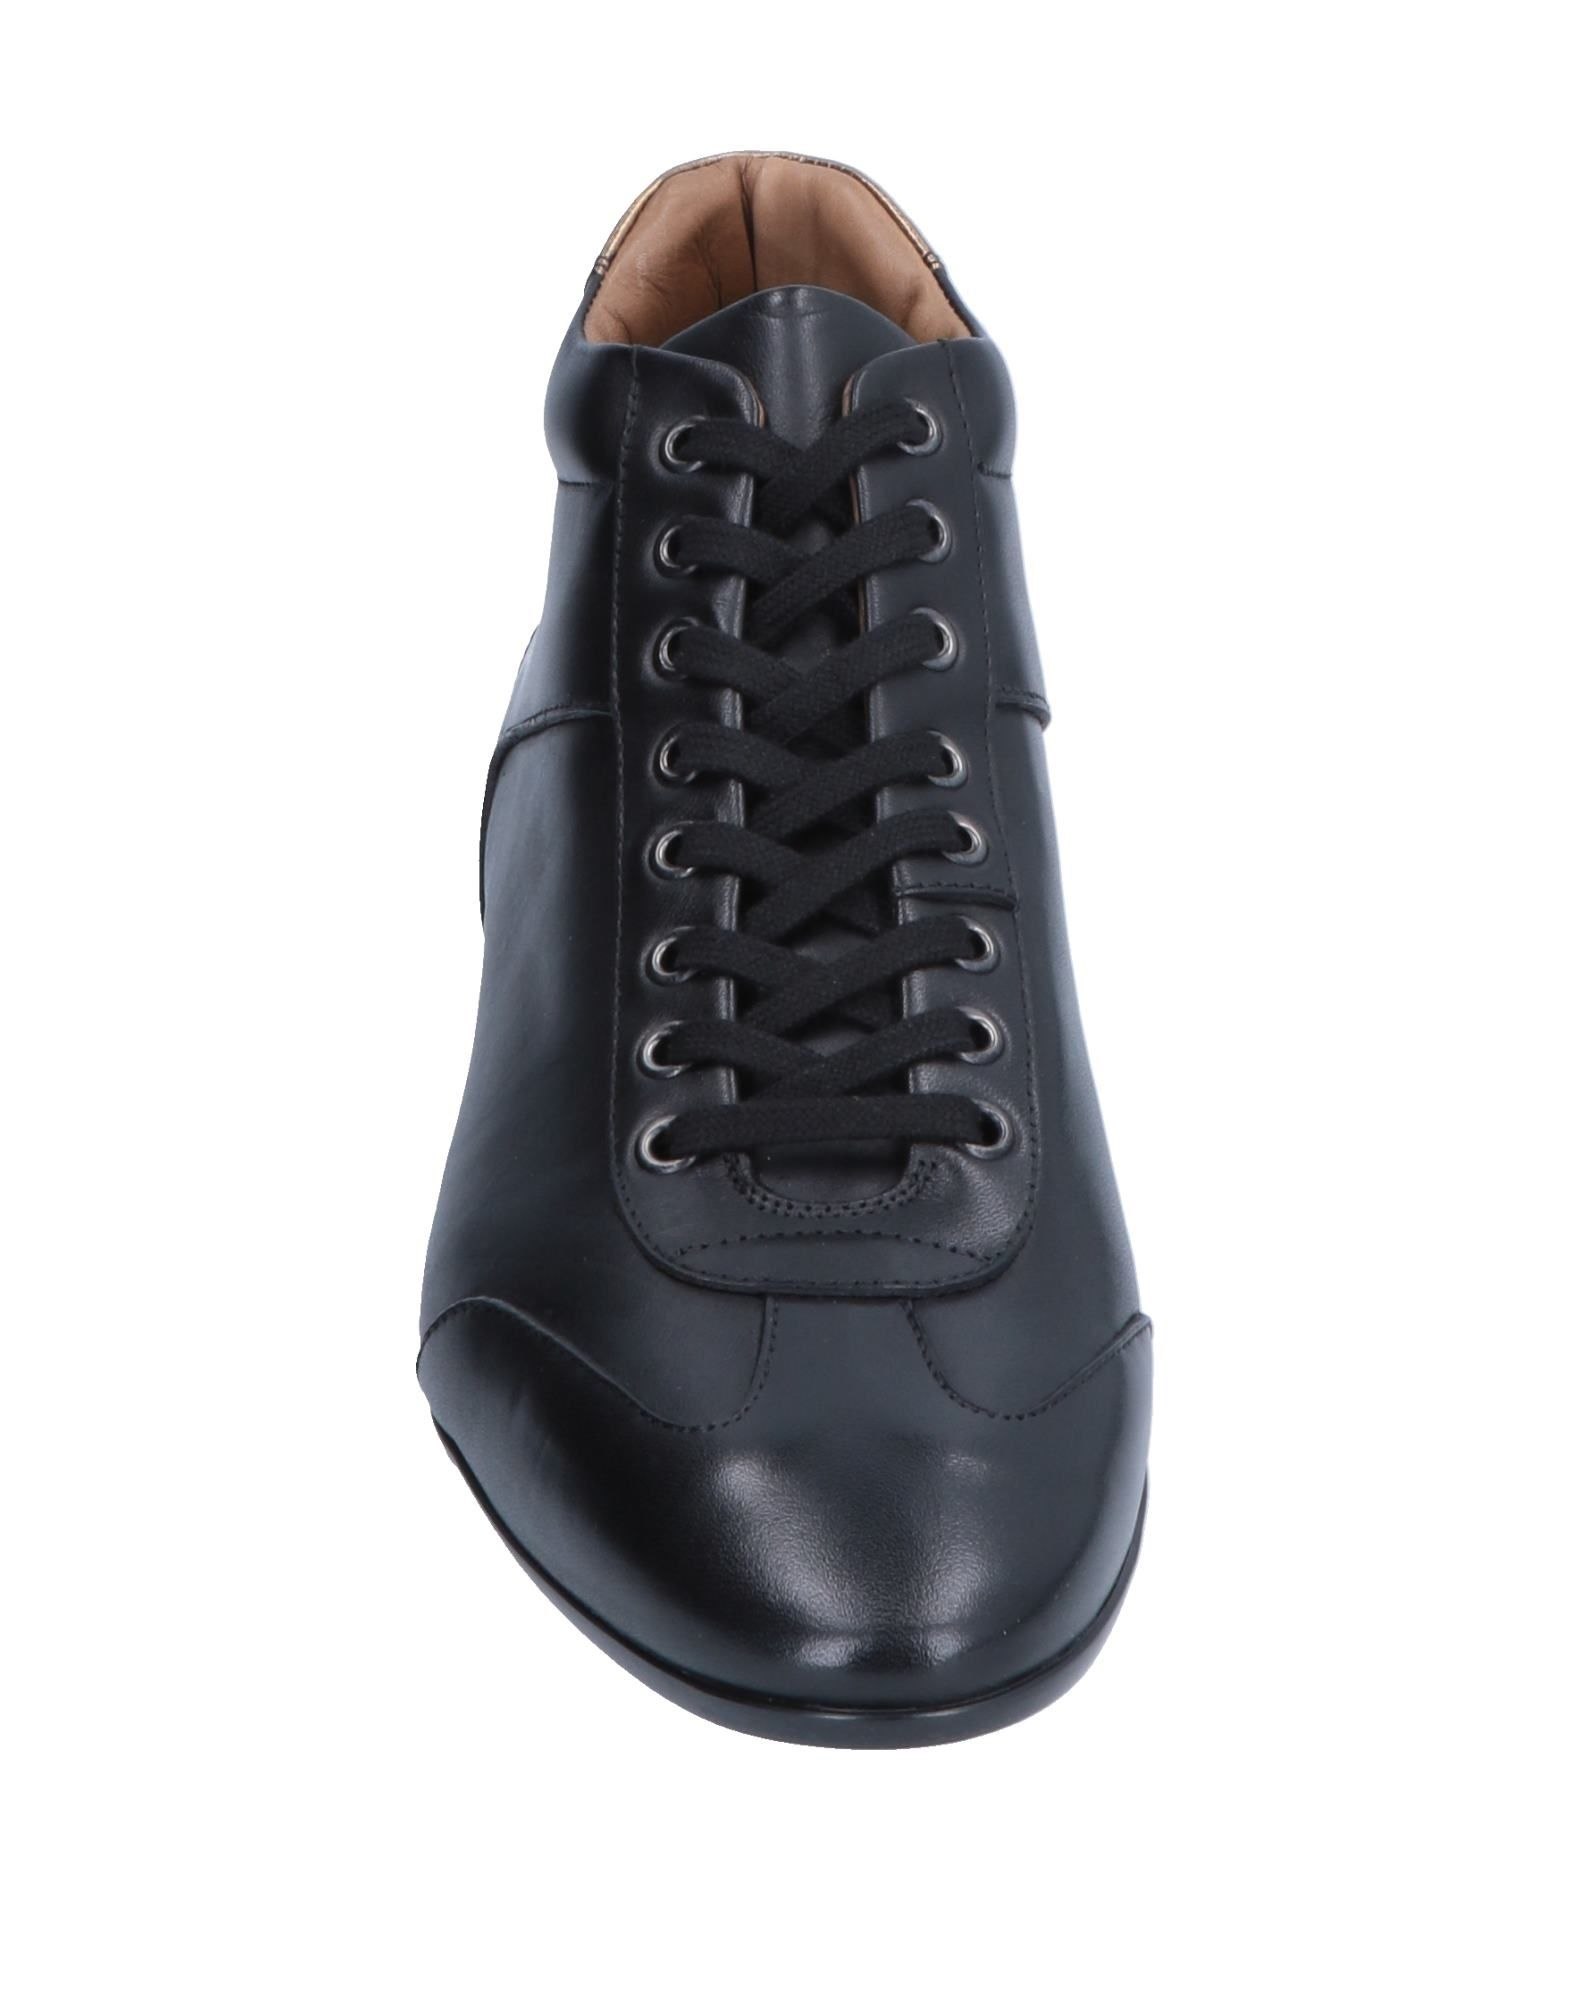 Fabiano Ricci Sneakers Herren  11546729OA Gute Qualität beliebte Schuhe